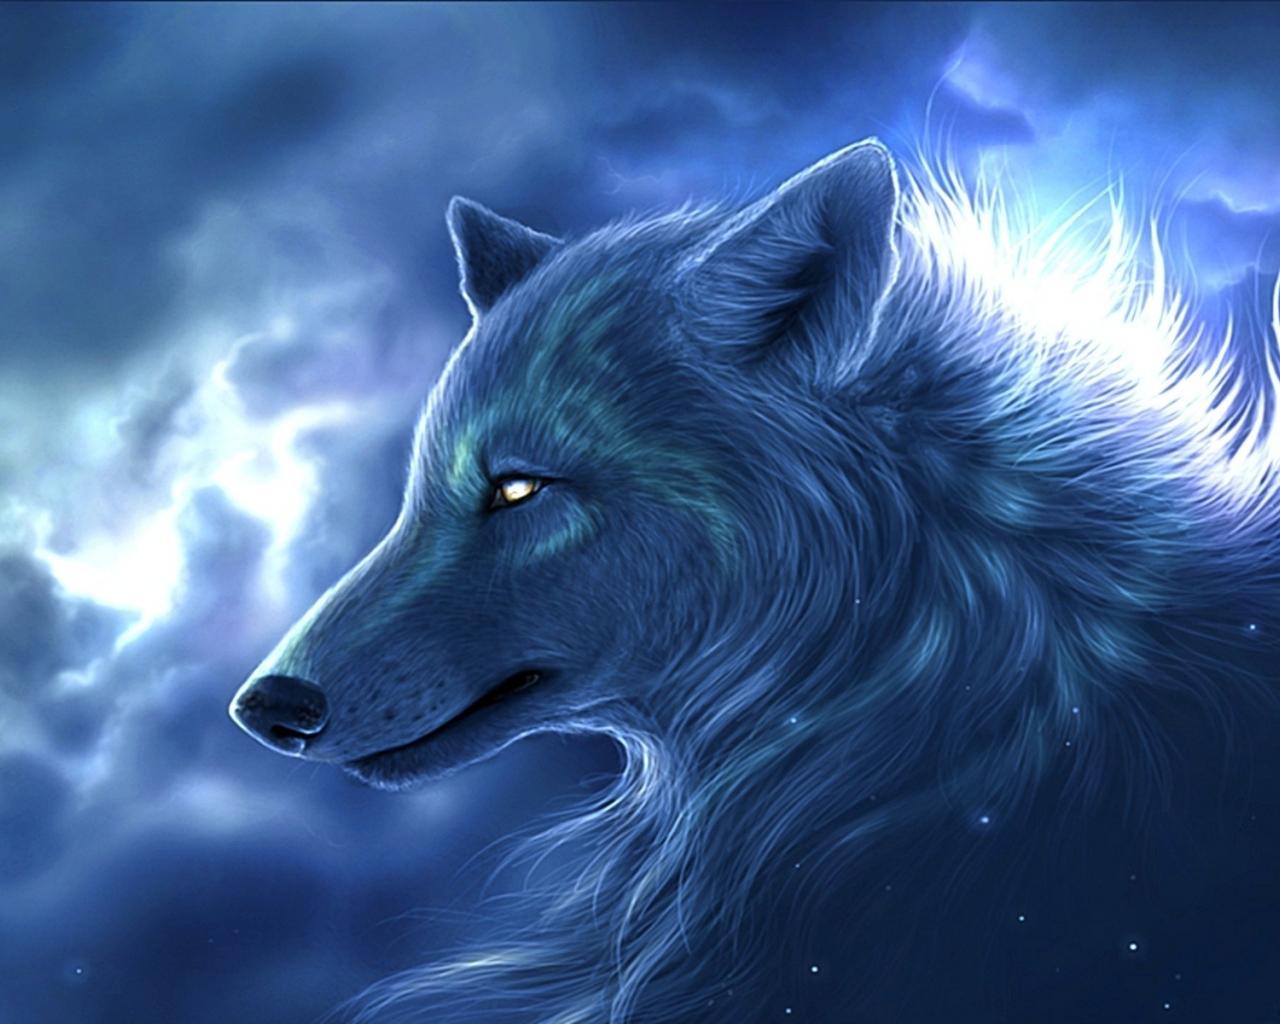 Spirit Animals Wallpaper Wolf 3 HD Wallpaper Animals Wallpapers 1280x1024